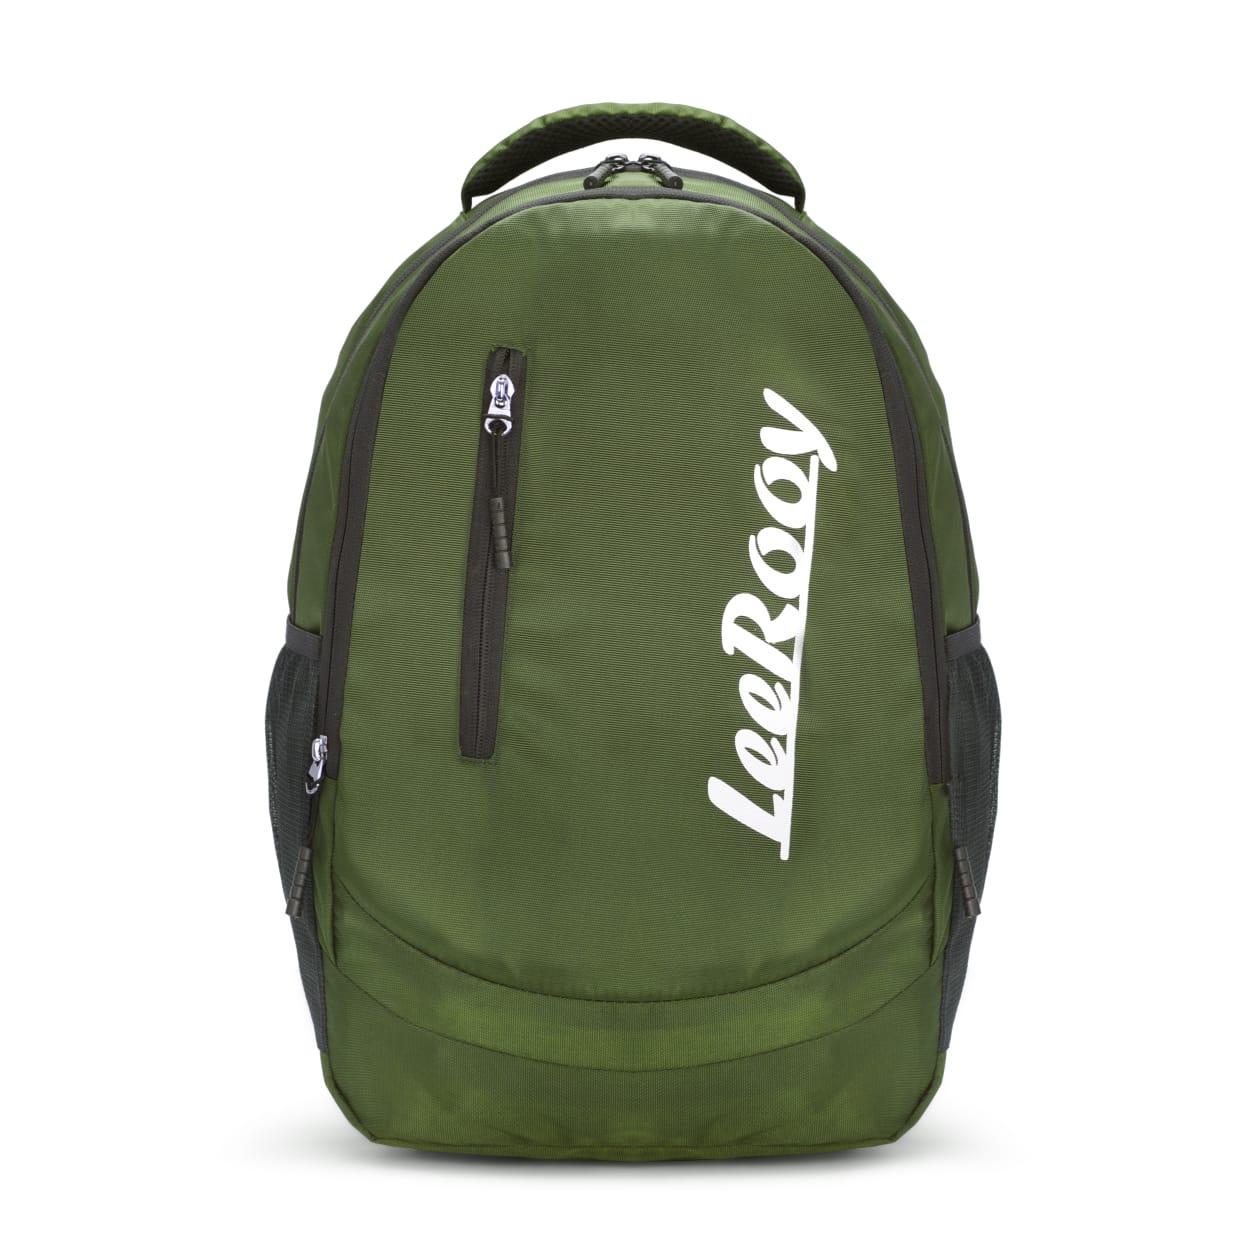 LeeRooy 20 LGreen Laptop Bag for Women and Men Backpacks for Girls Boys Stylish Trending Bagpack School Bag